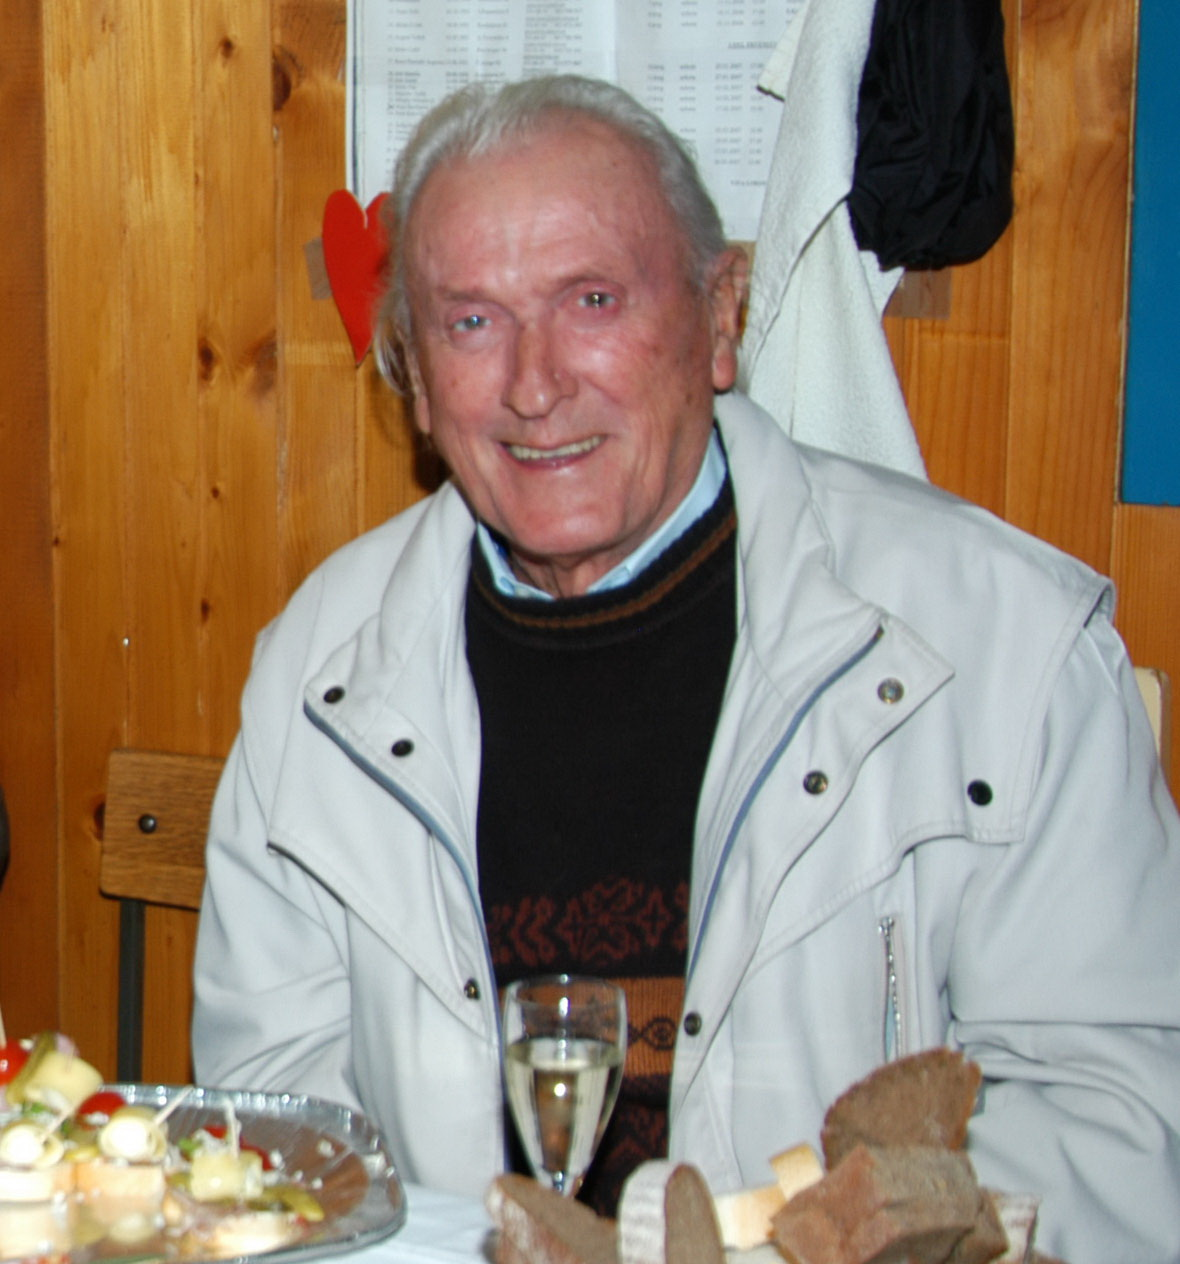 Vinko Mandl, 2007